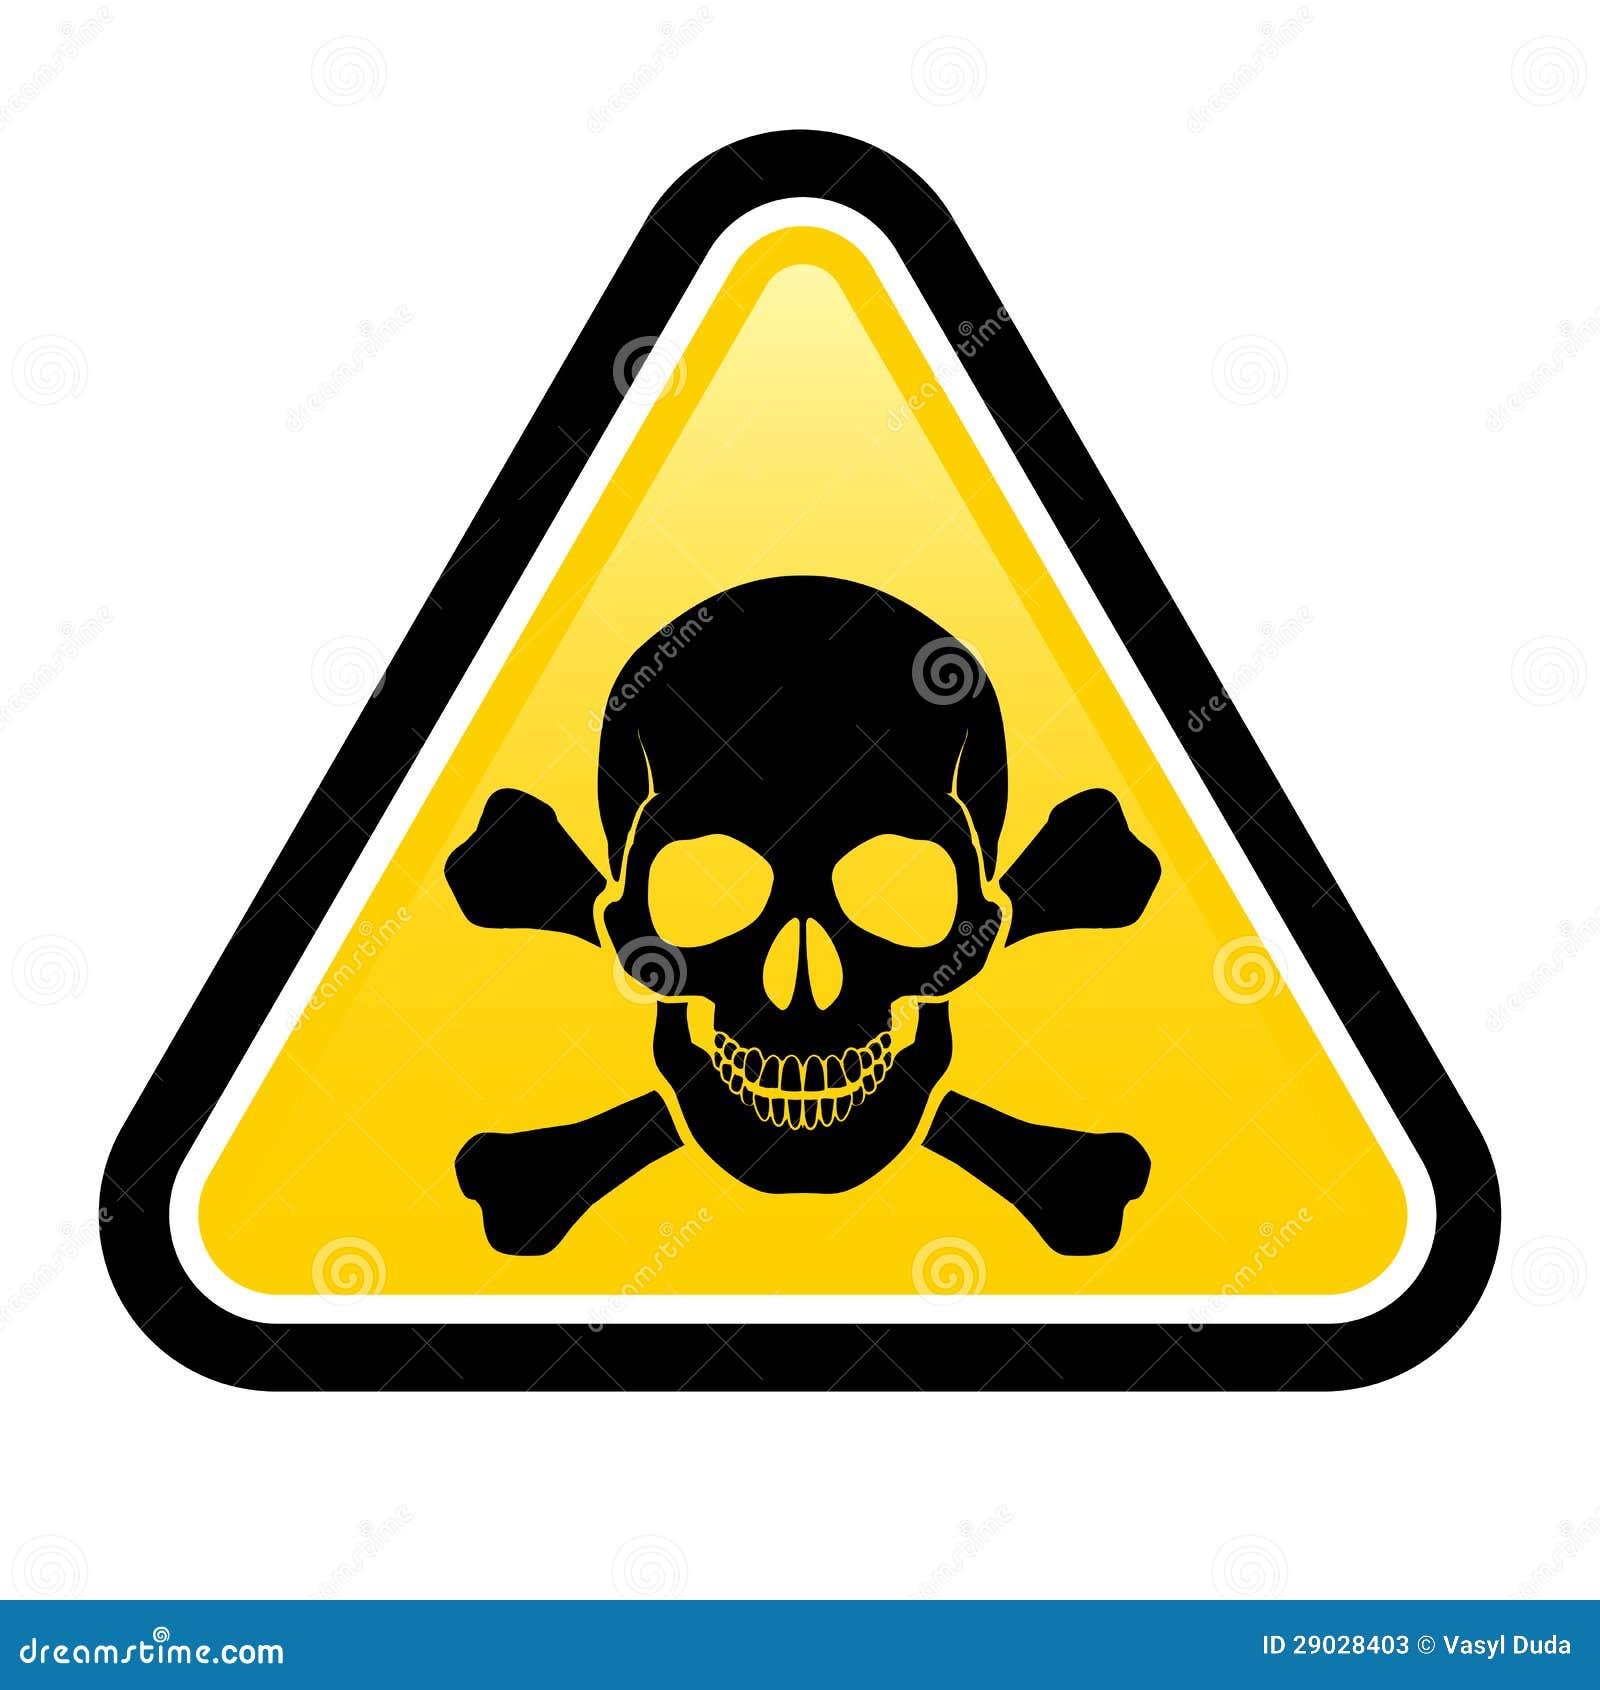 skull danger signs stock vector illustration of current